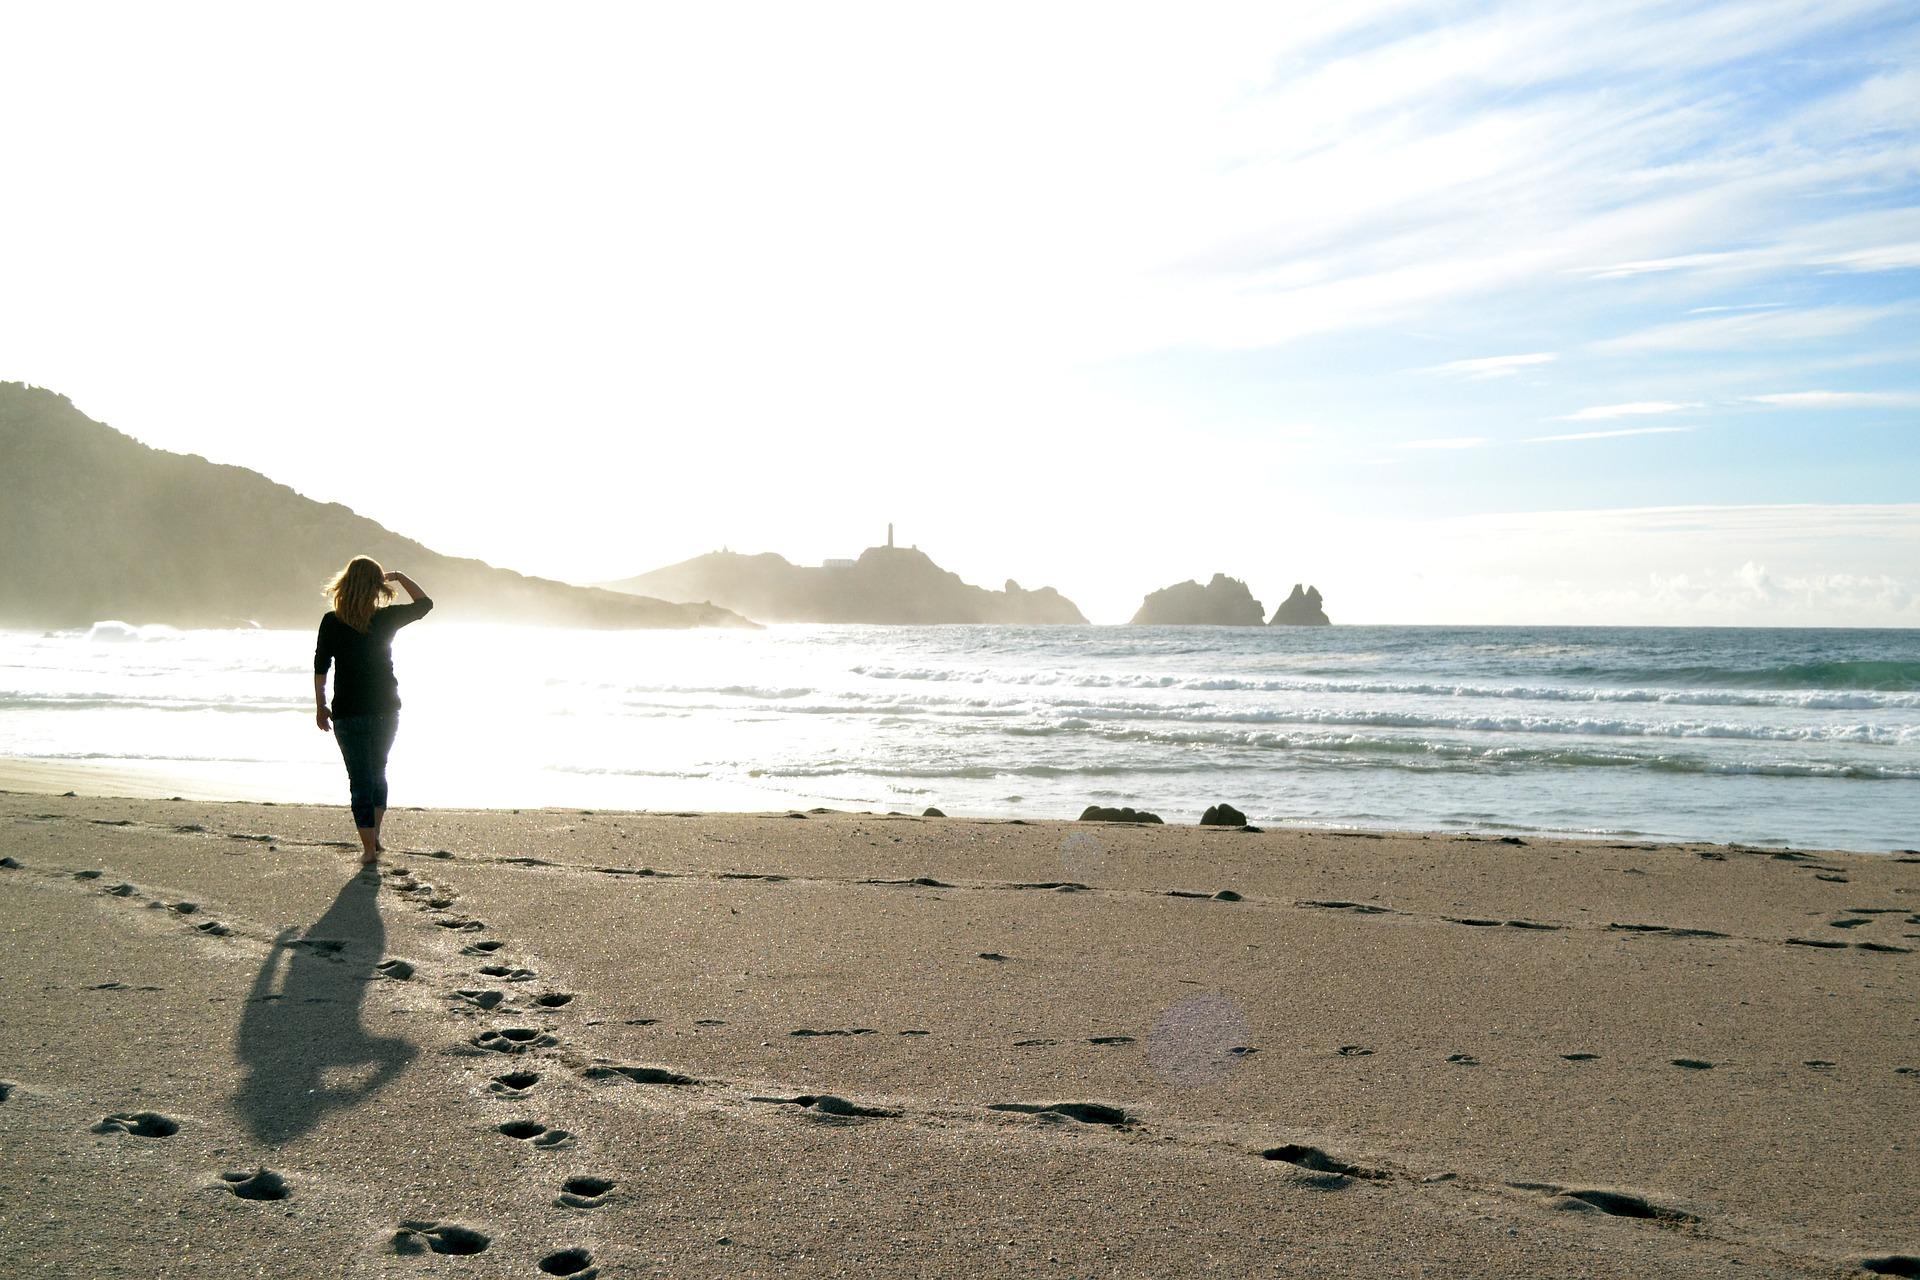 balade à la plage - bord de mer